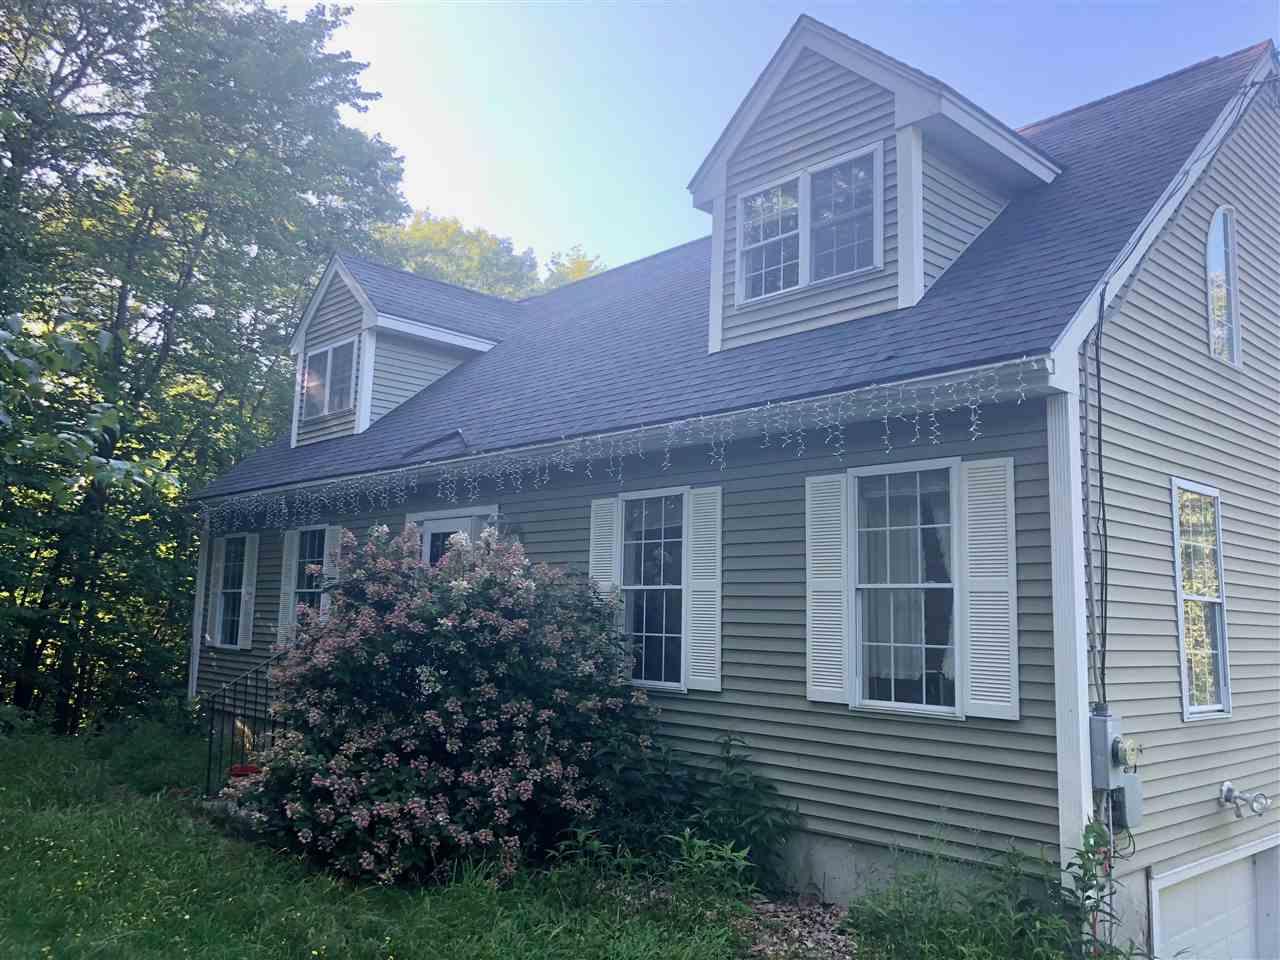 Real Estate FOR SALE - 747 East Side, Alton, NH 03809 - MLS® #4713379